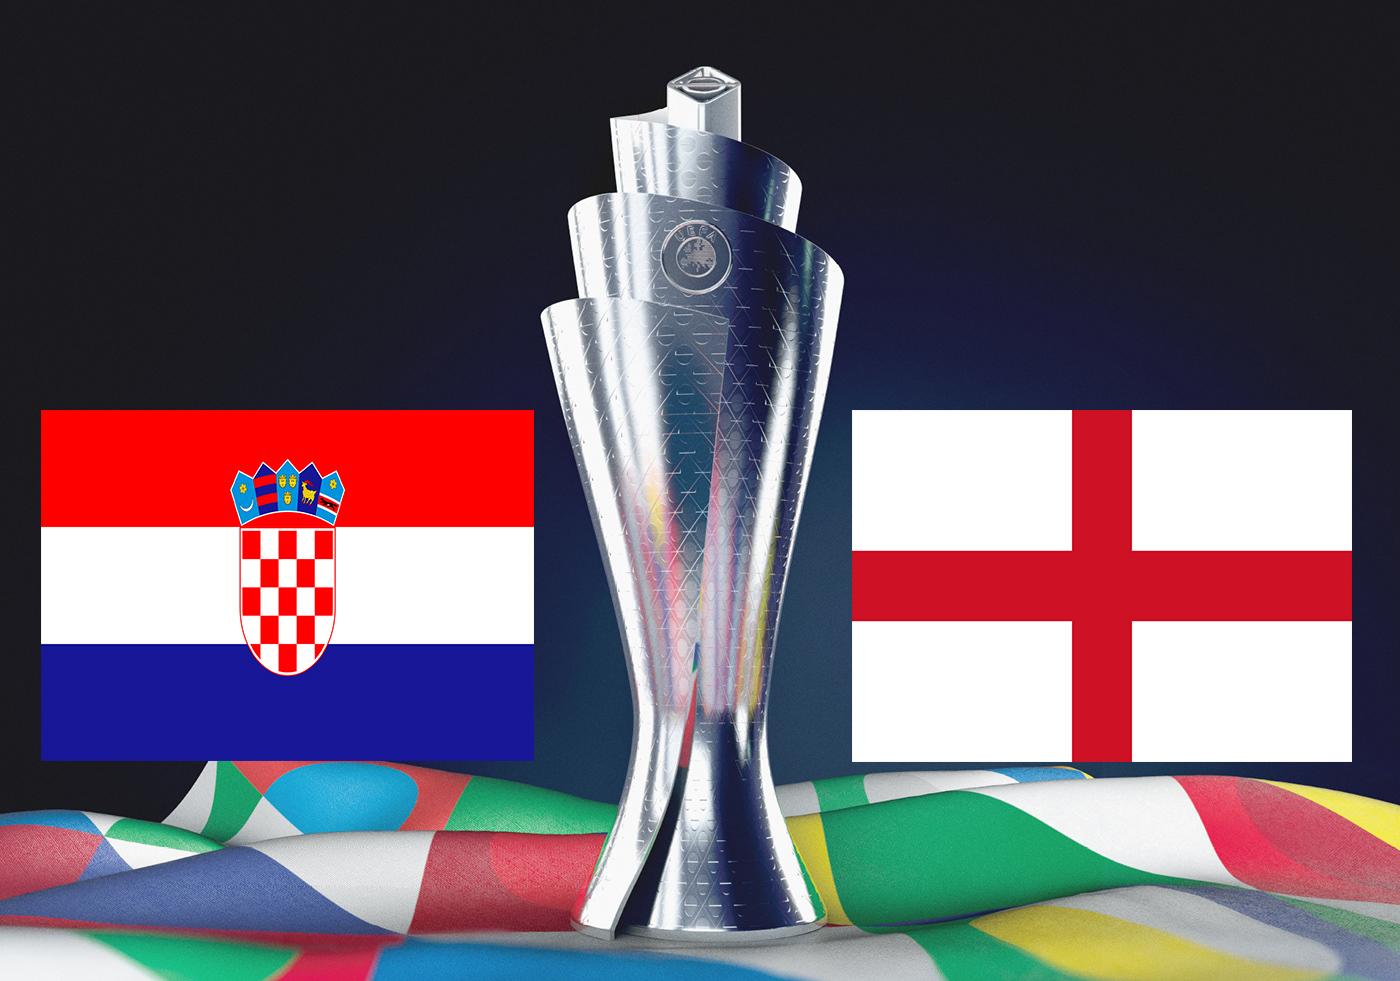 soi-keo-ca-cuoc-bong-da-ngay-13-10-croatia-vs-anh-tam-su-rua-han-b9 1